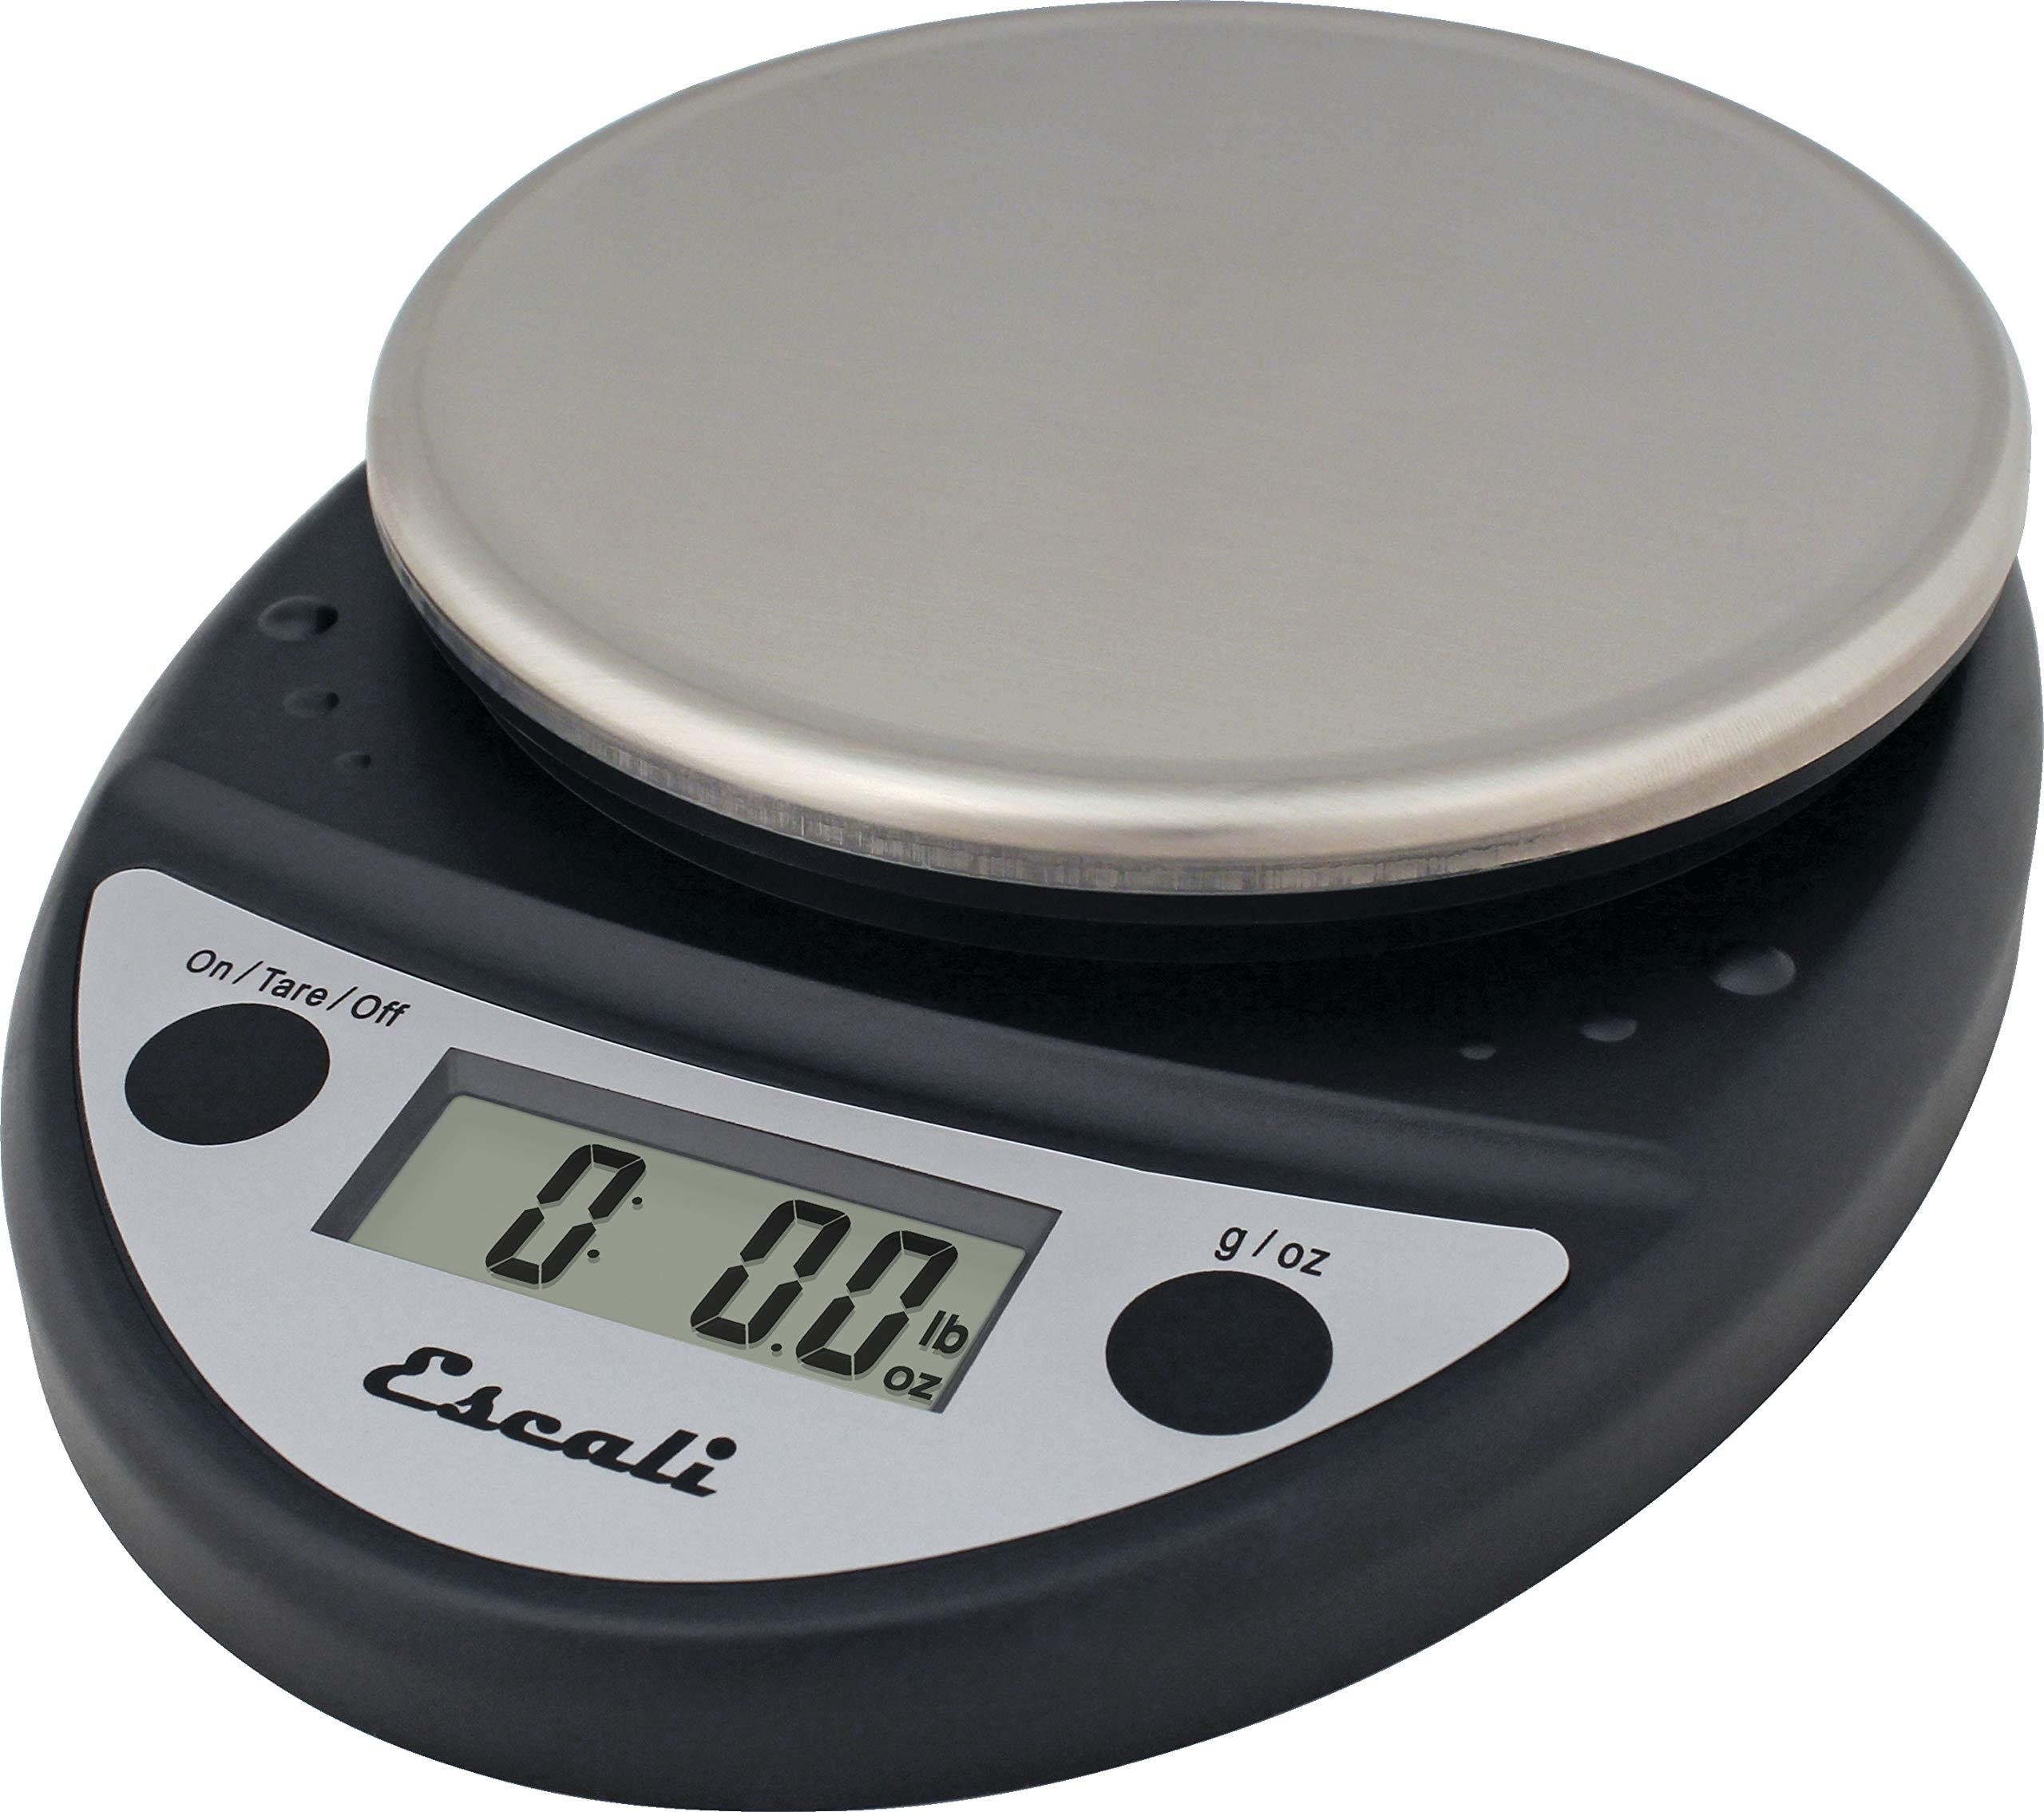 San Jamar SCDGP11BK Professional Round Digital Food/Kitchen Scale, 11 lb Capacity, Black by San Jamar